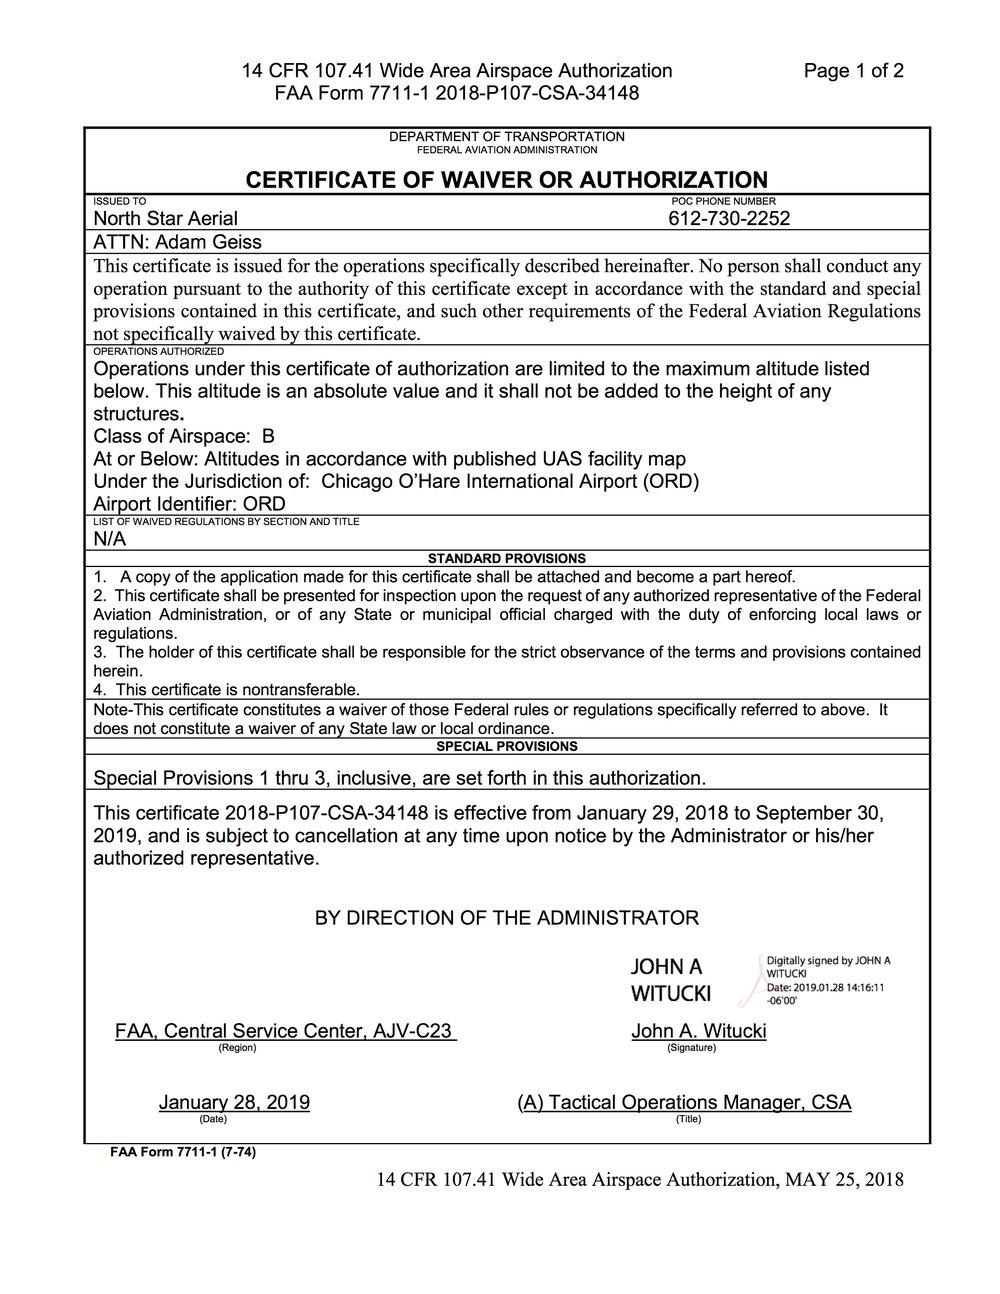 FAA Form 7711-1 2018-P107-CSA-34148 (1) ORD.jpg